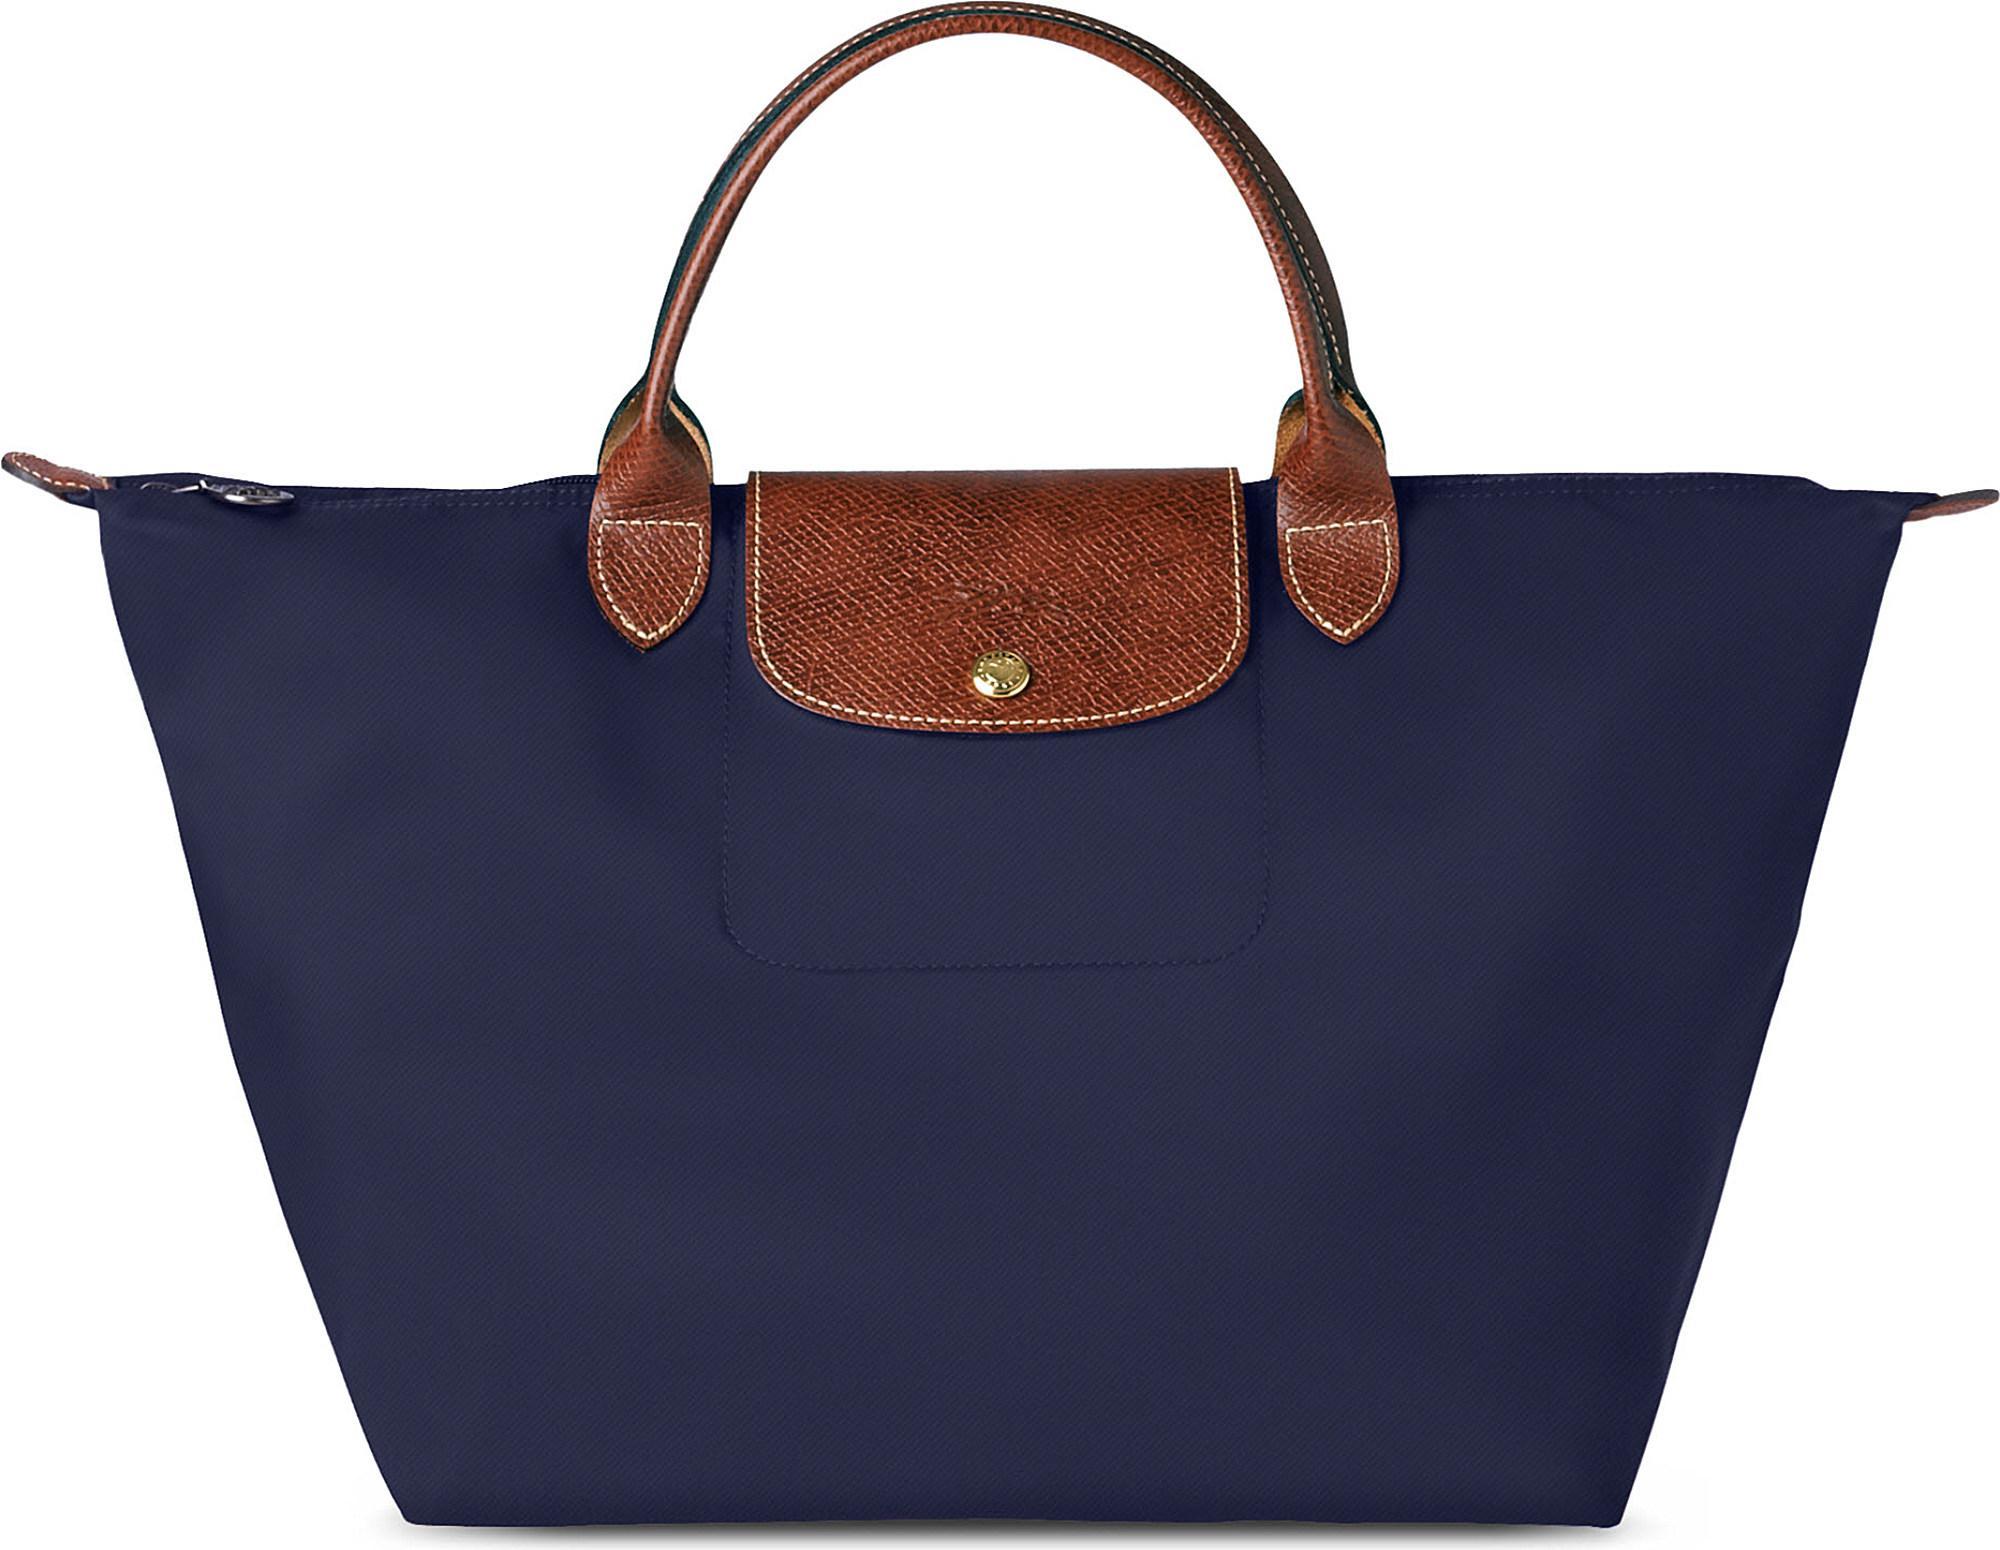 3112b4b6e18 Longchamp Le Pliage Medium Handbag In Navy in Blue - Save 13% - Lyst